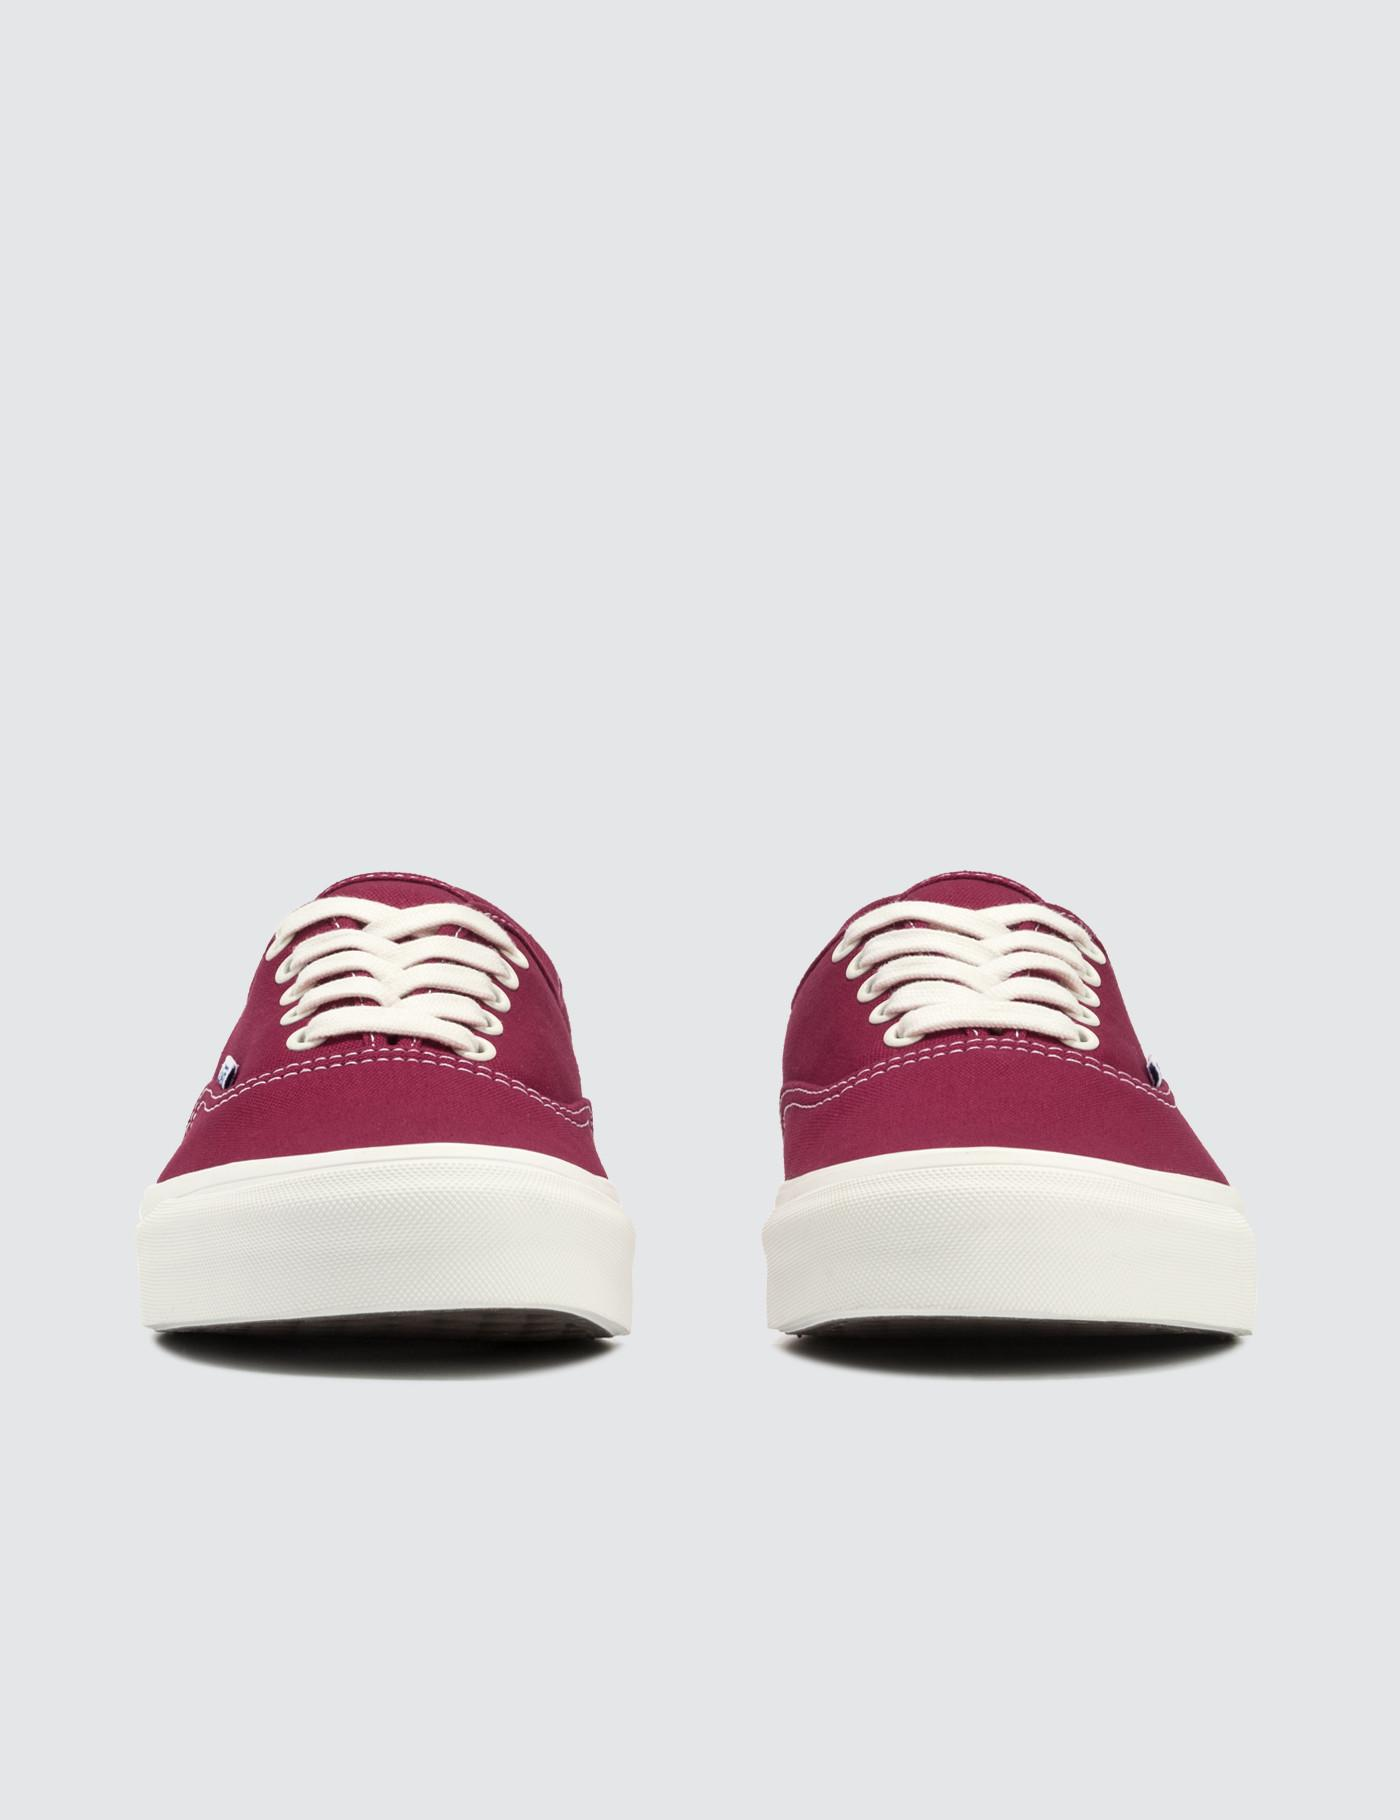 961ddb5007df39 Lyst - Vans Vault Og Authentic Lx in Red for Men